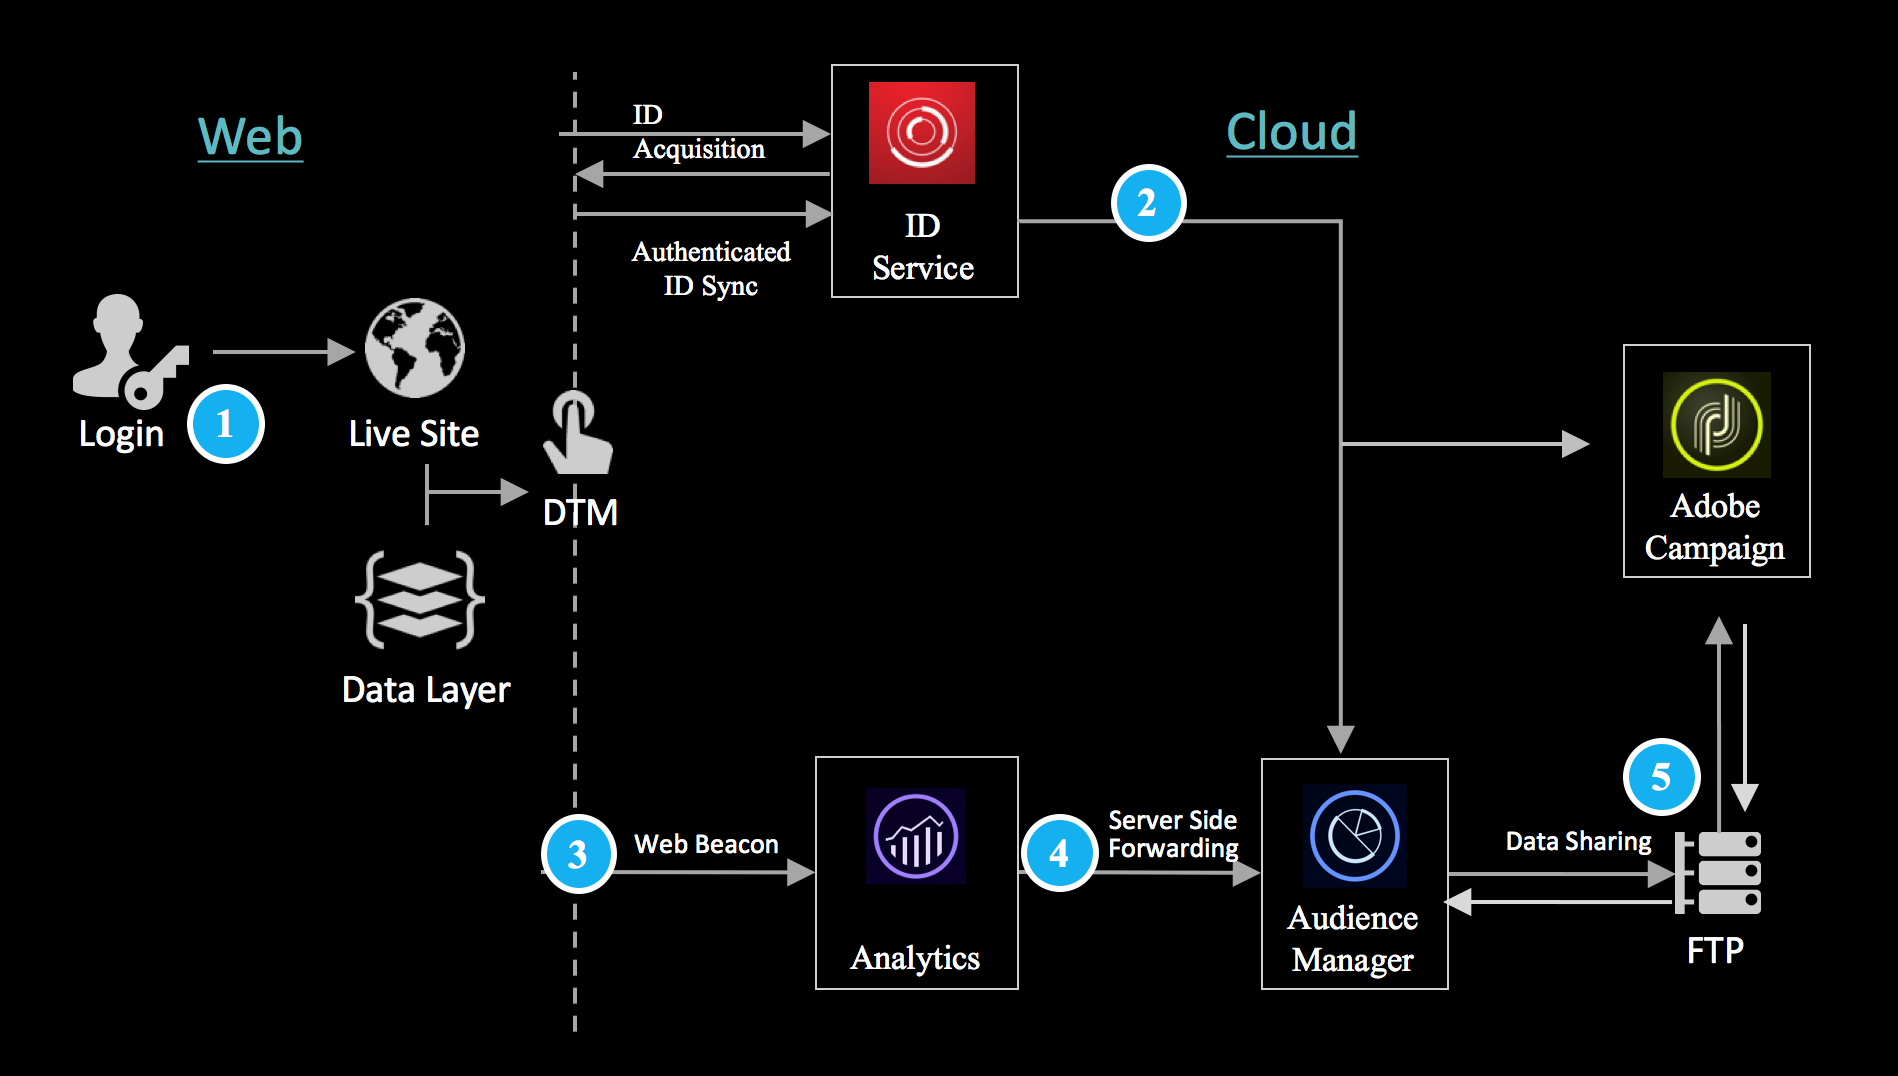 declared ip integration